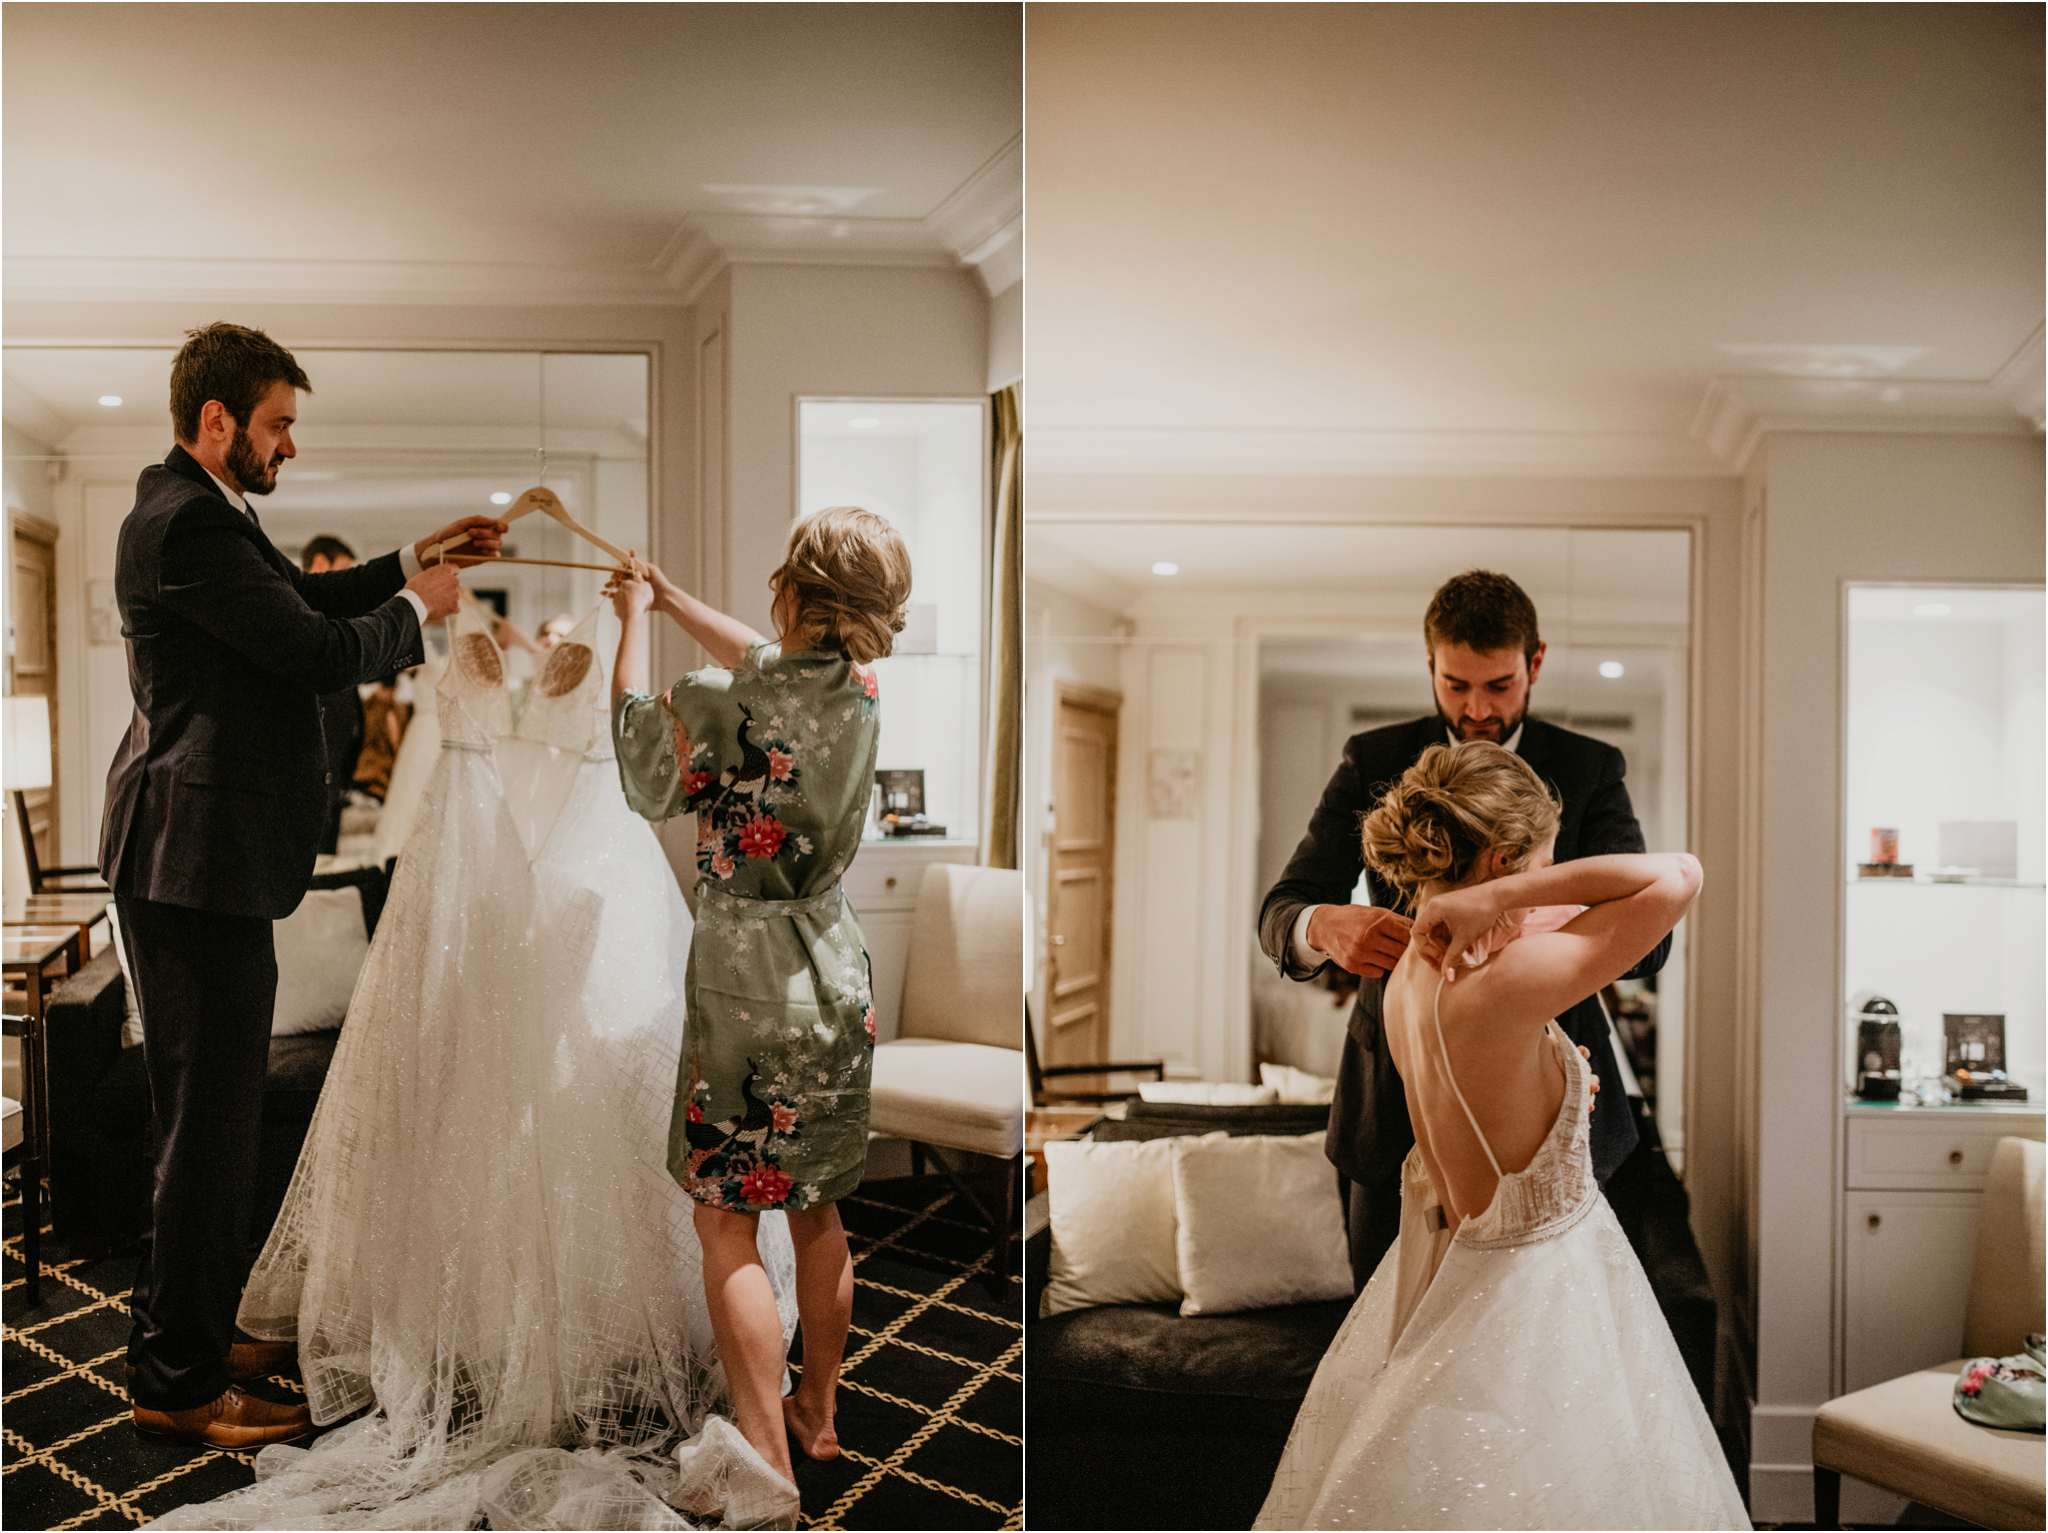 miranda-and-jared-paris-elopement-destination-wedding-photographer-012.jpg